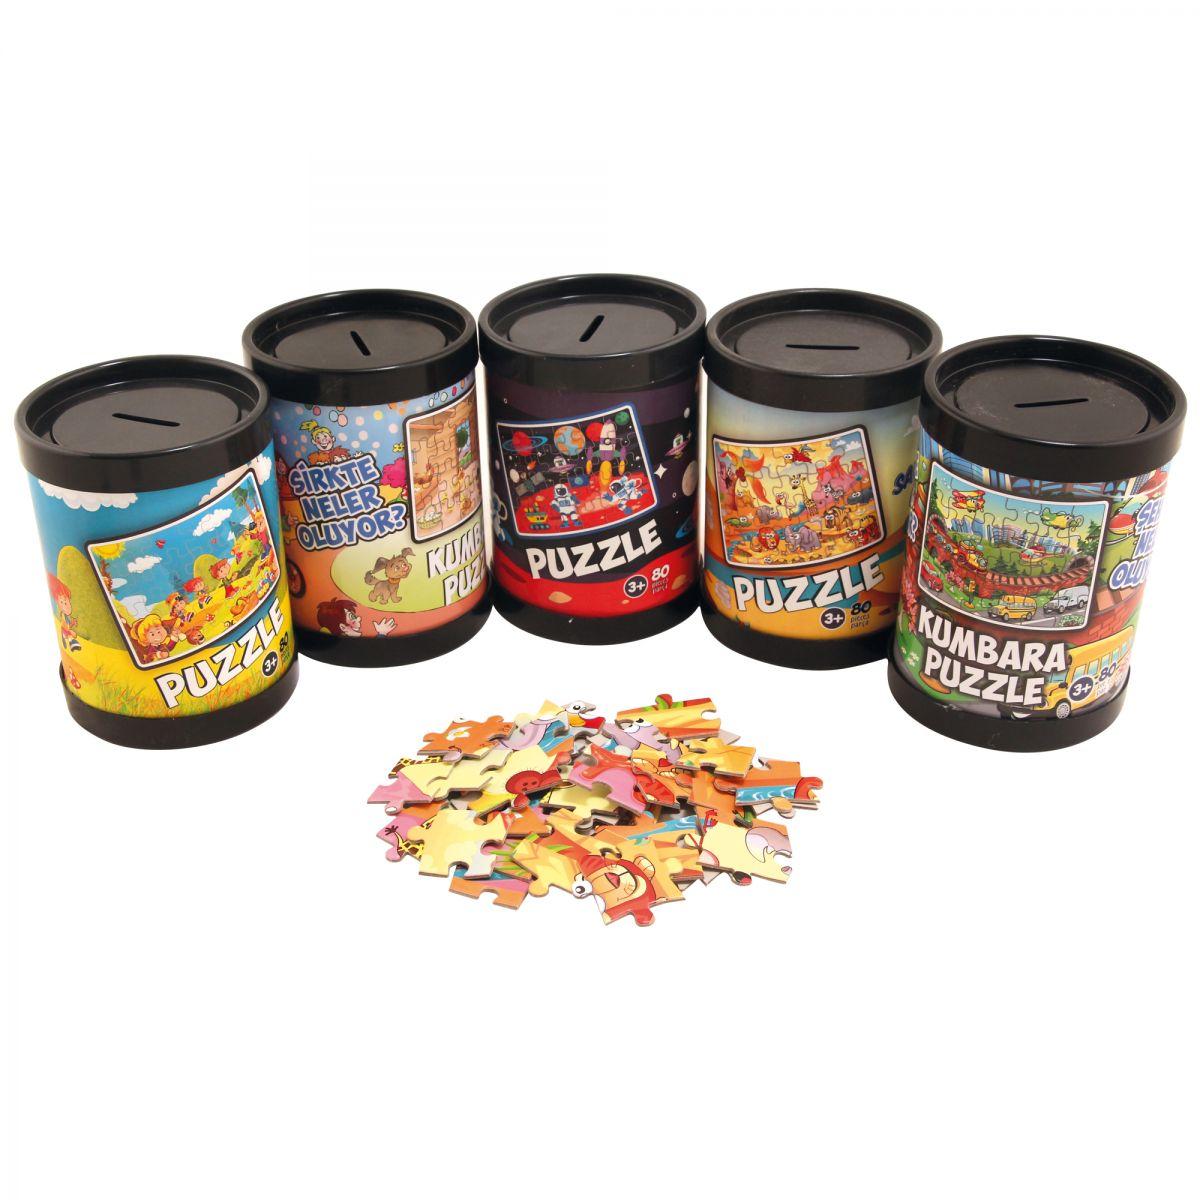 Rulo Kumbara Puzzle